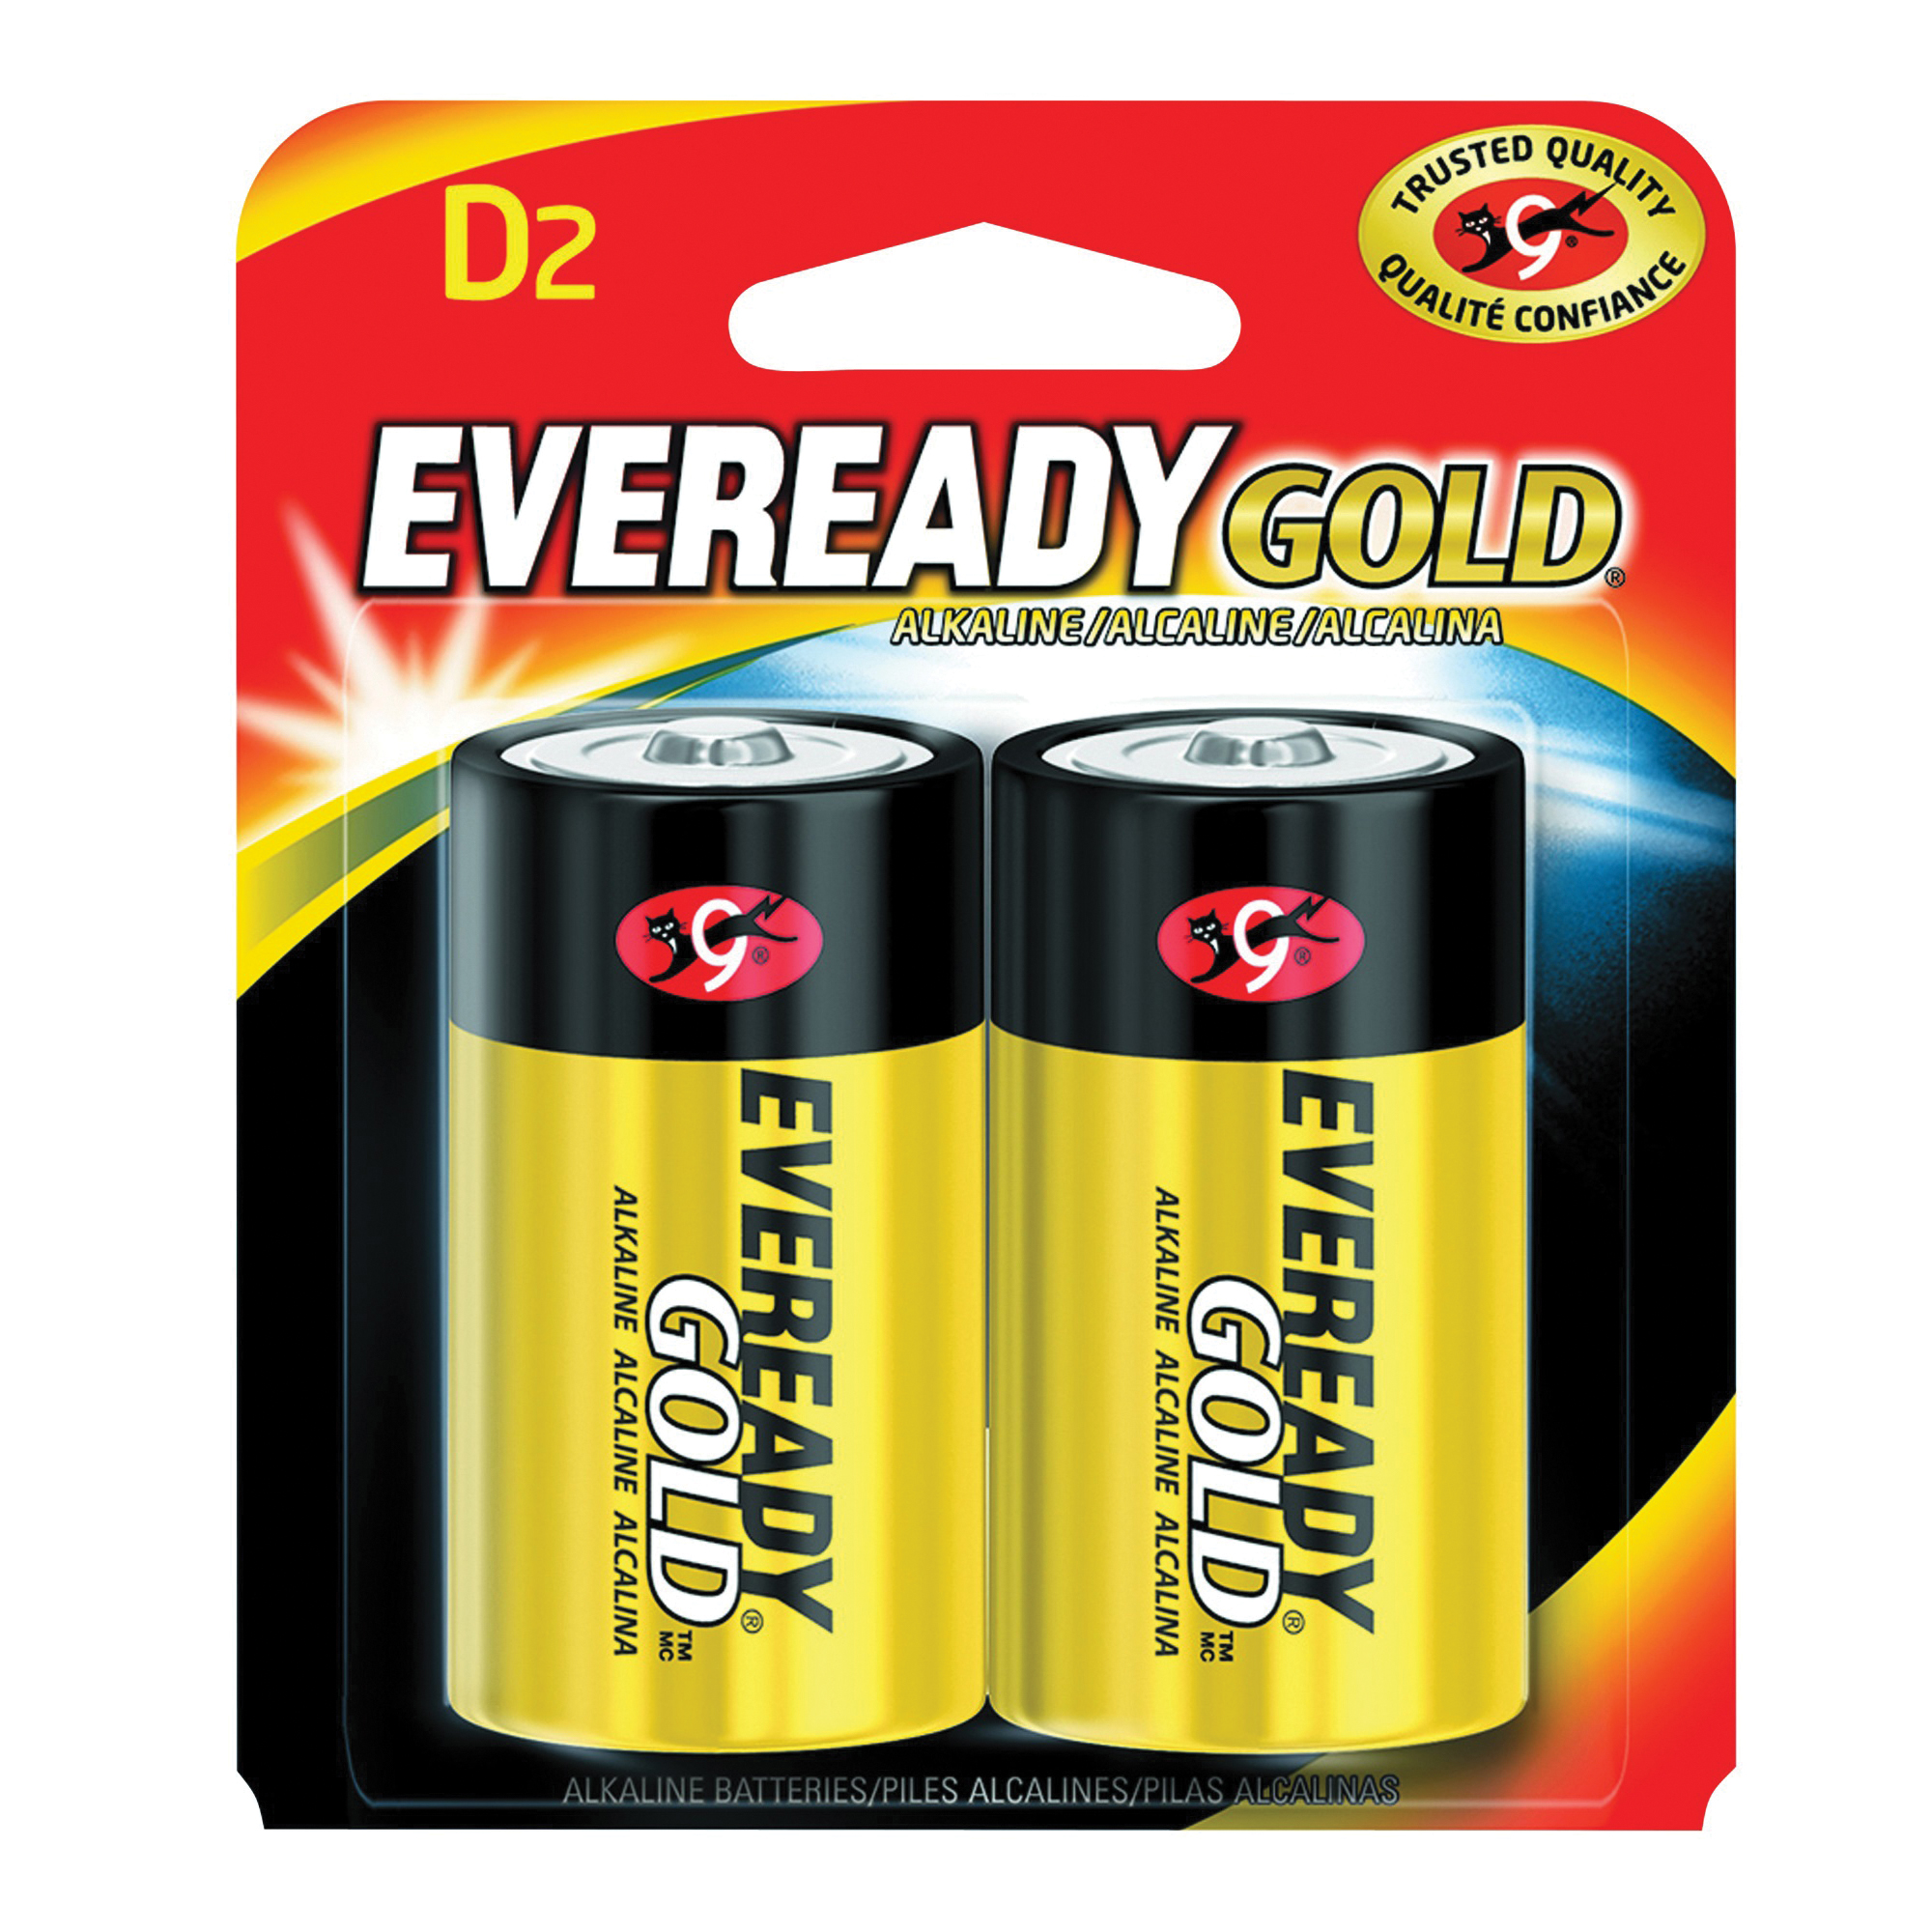 Picture of Energizer A95BP-2 Alkaline Battery, 1.5 V Battery, 19.5 Ah, D Battery, Zinc, Manganese Dioxide